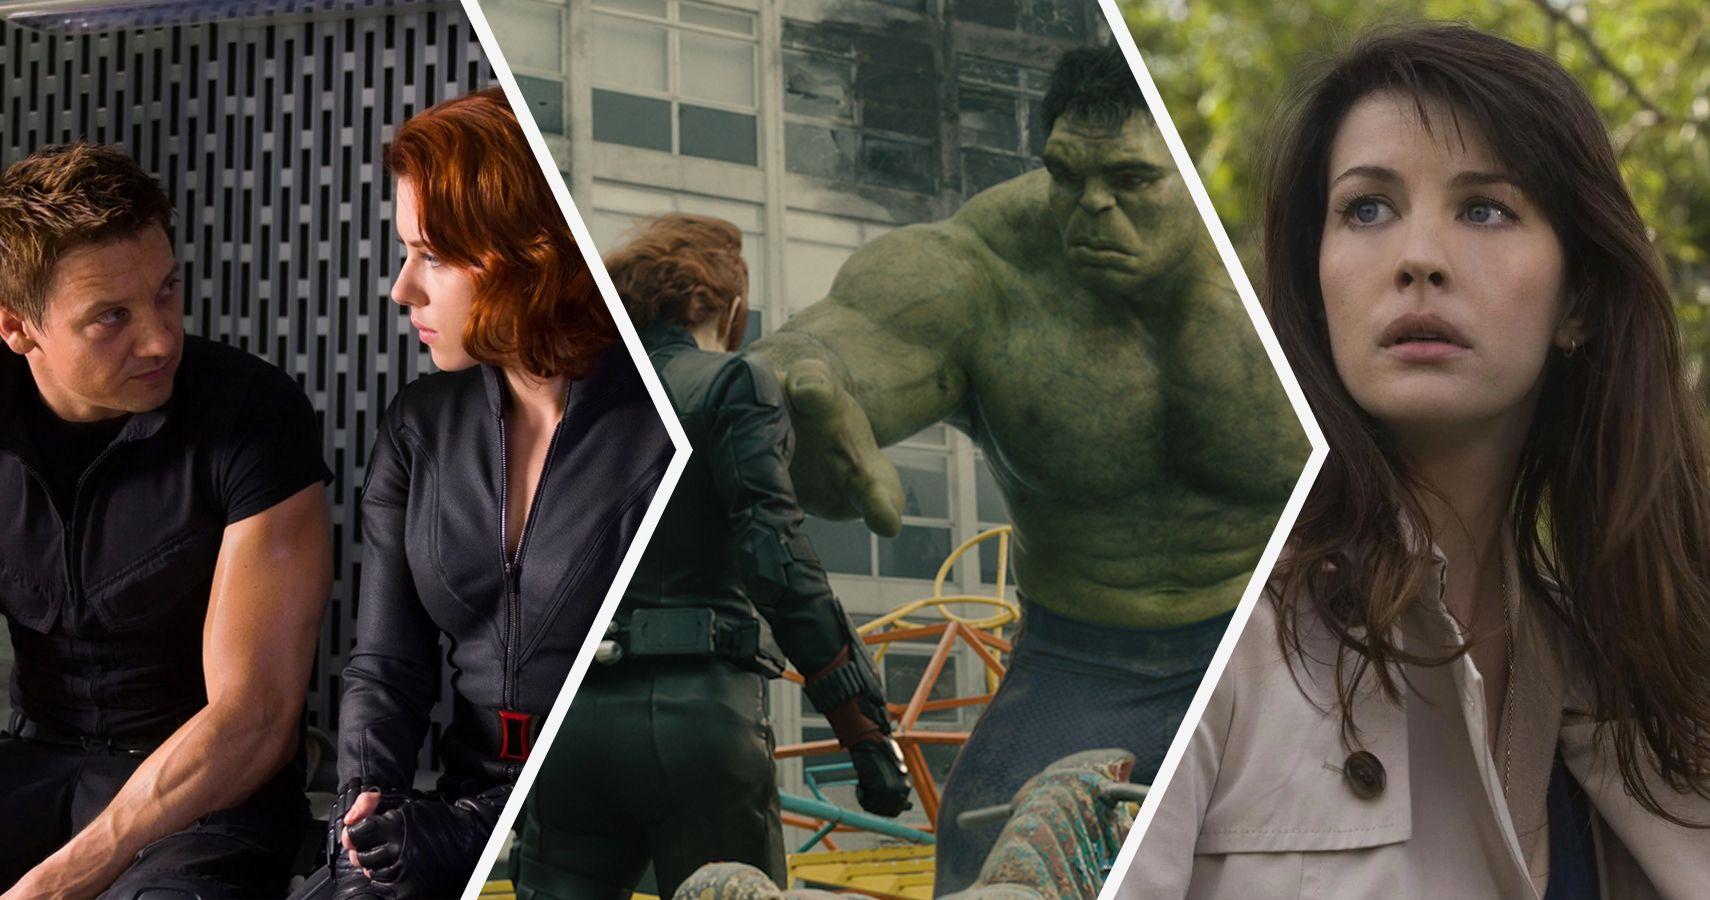 20 Things That Make No Sense About The Hulk And Black